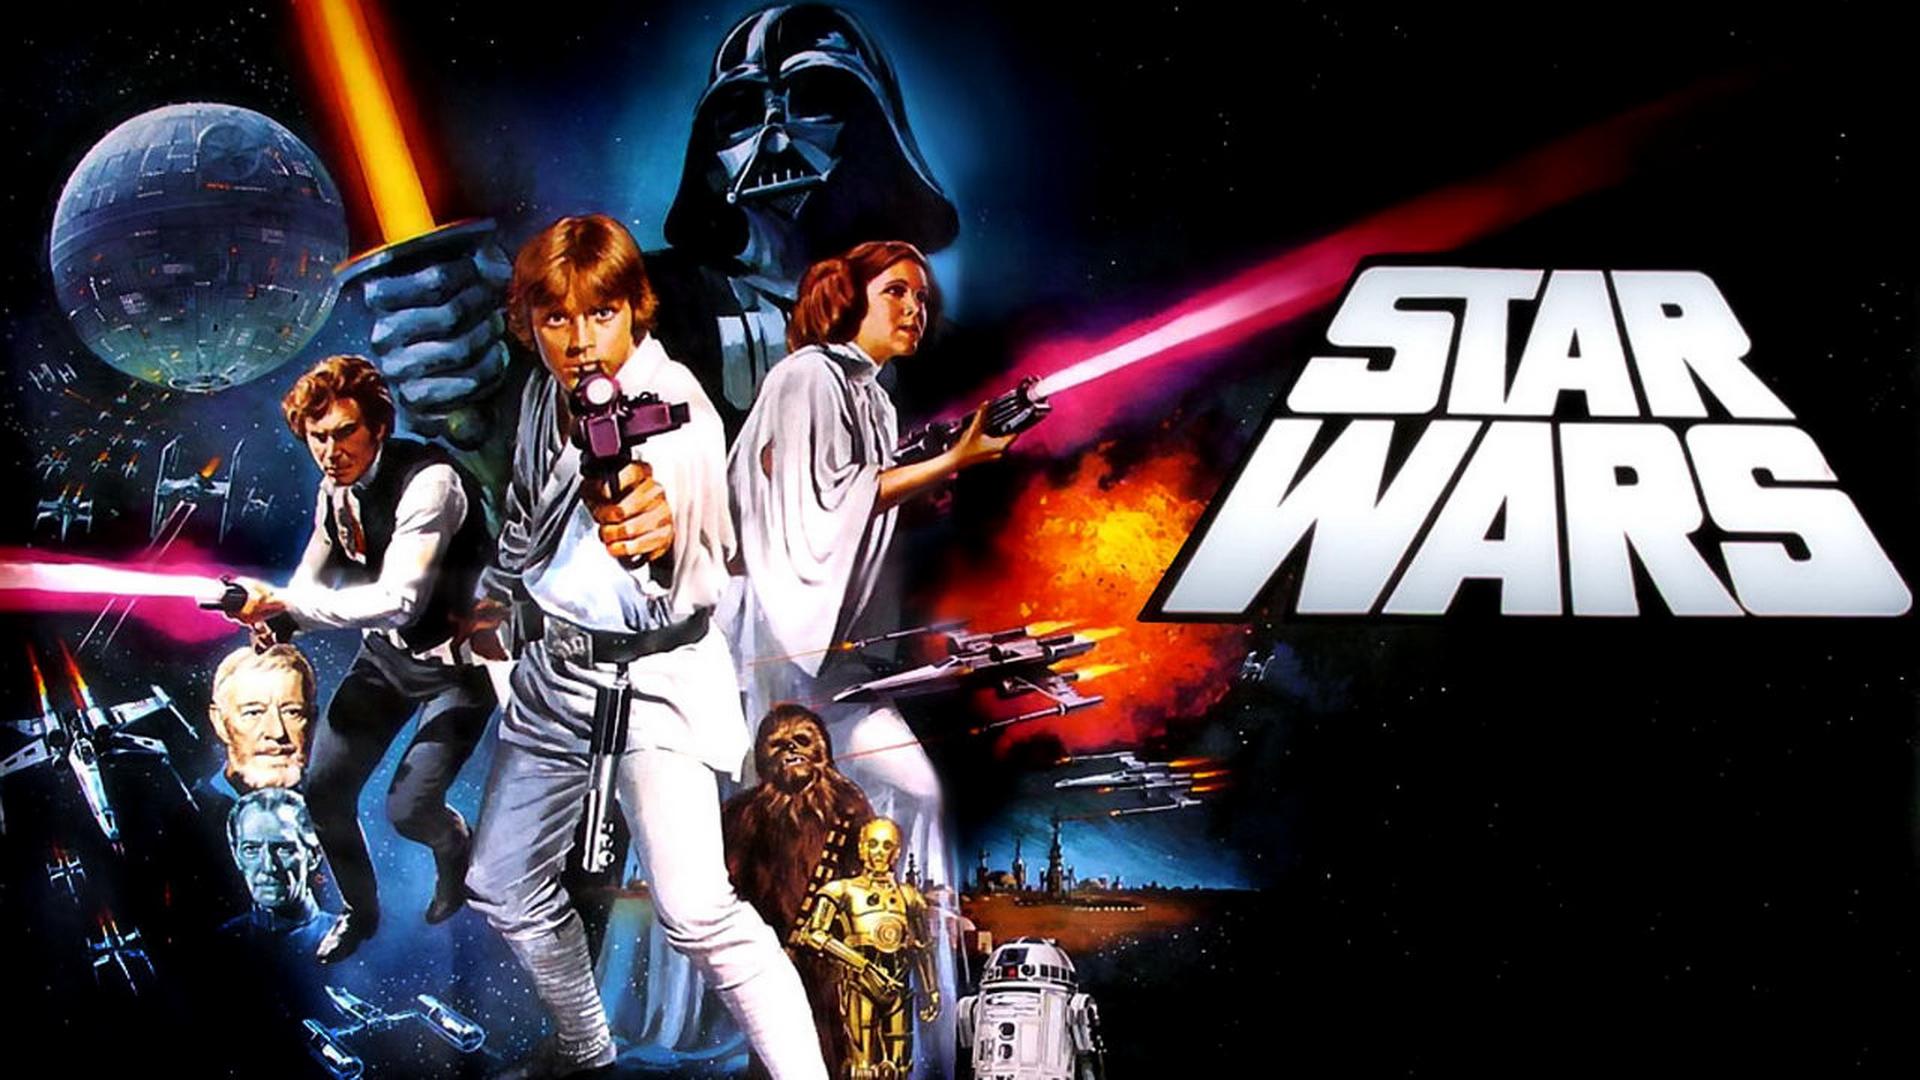 Star Wars Episode IV A New Hope Wallpaper HD 1080p 6 HD Desktop 1920x1080